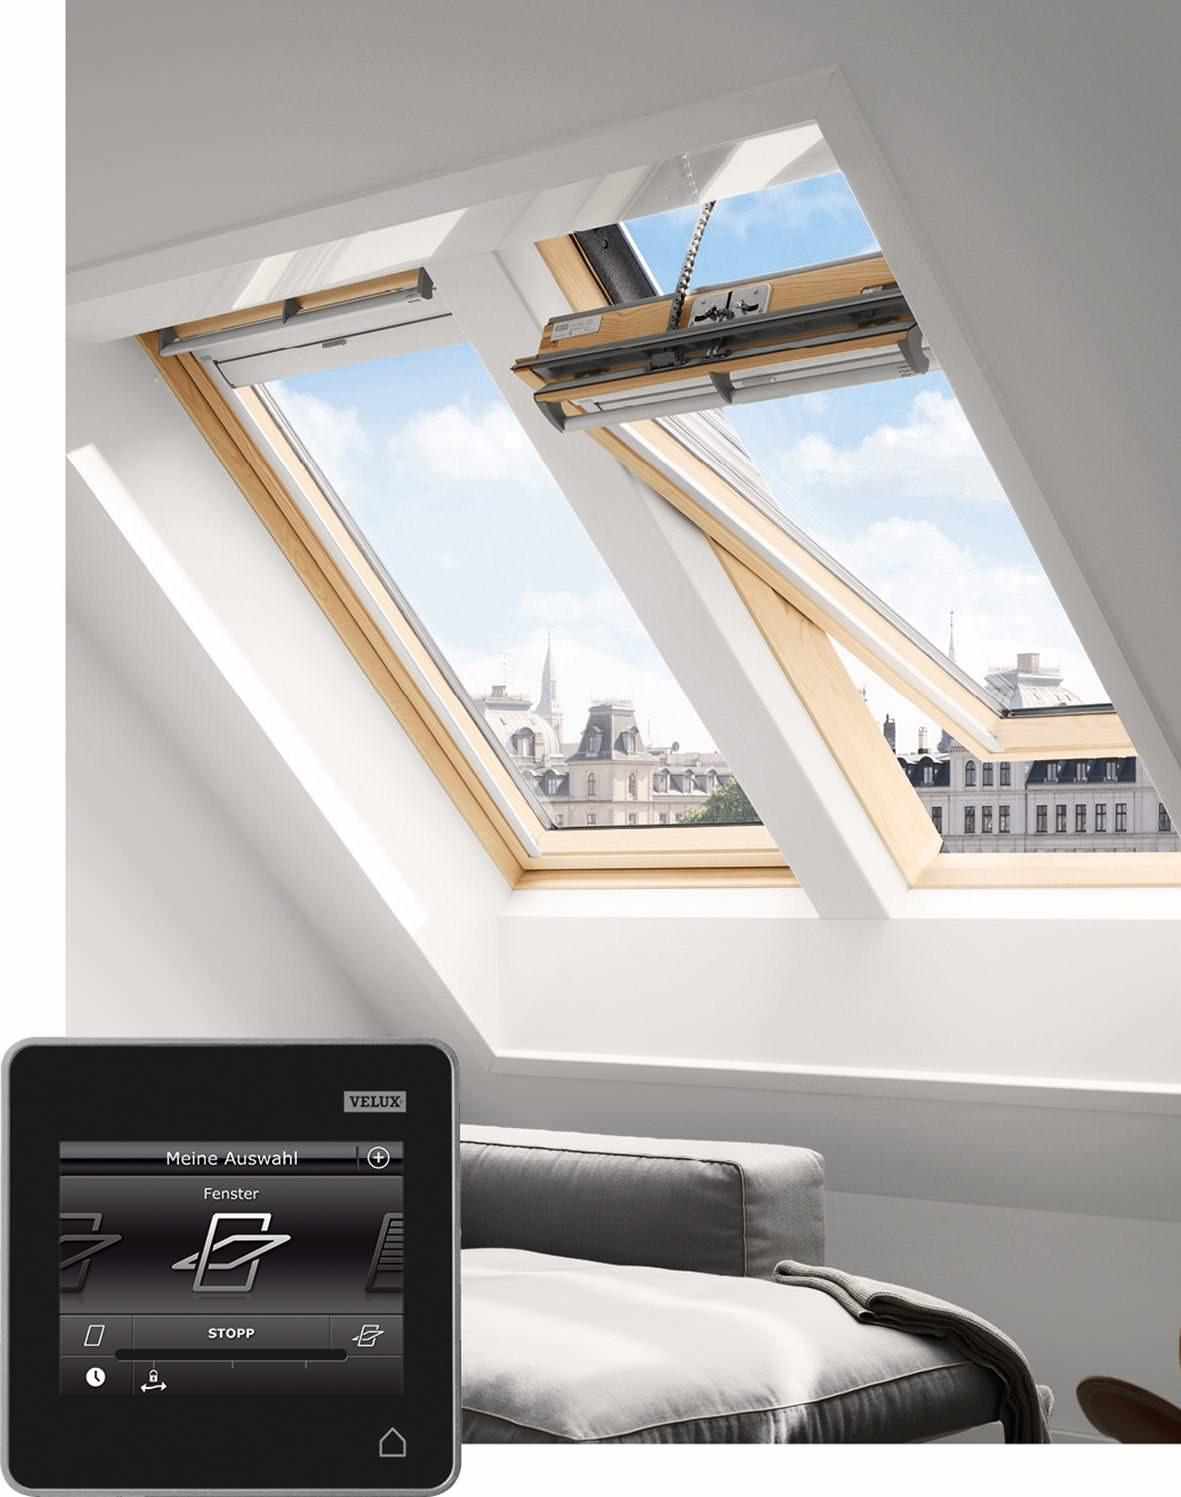 velux dachfenster ggl 316030 holz integra solarfenster klar lackiert thermo plus kupfer. Black Bedroom Furniture Sets. Home Design Ideas